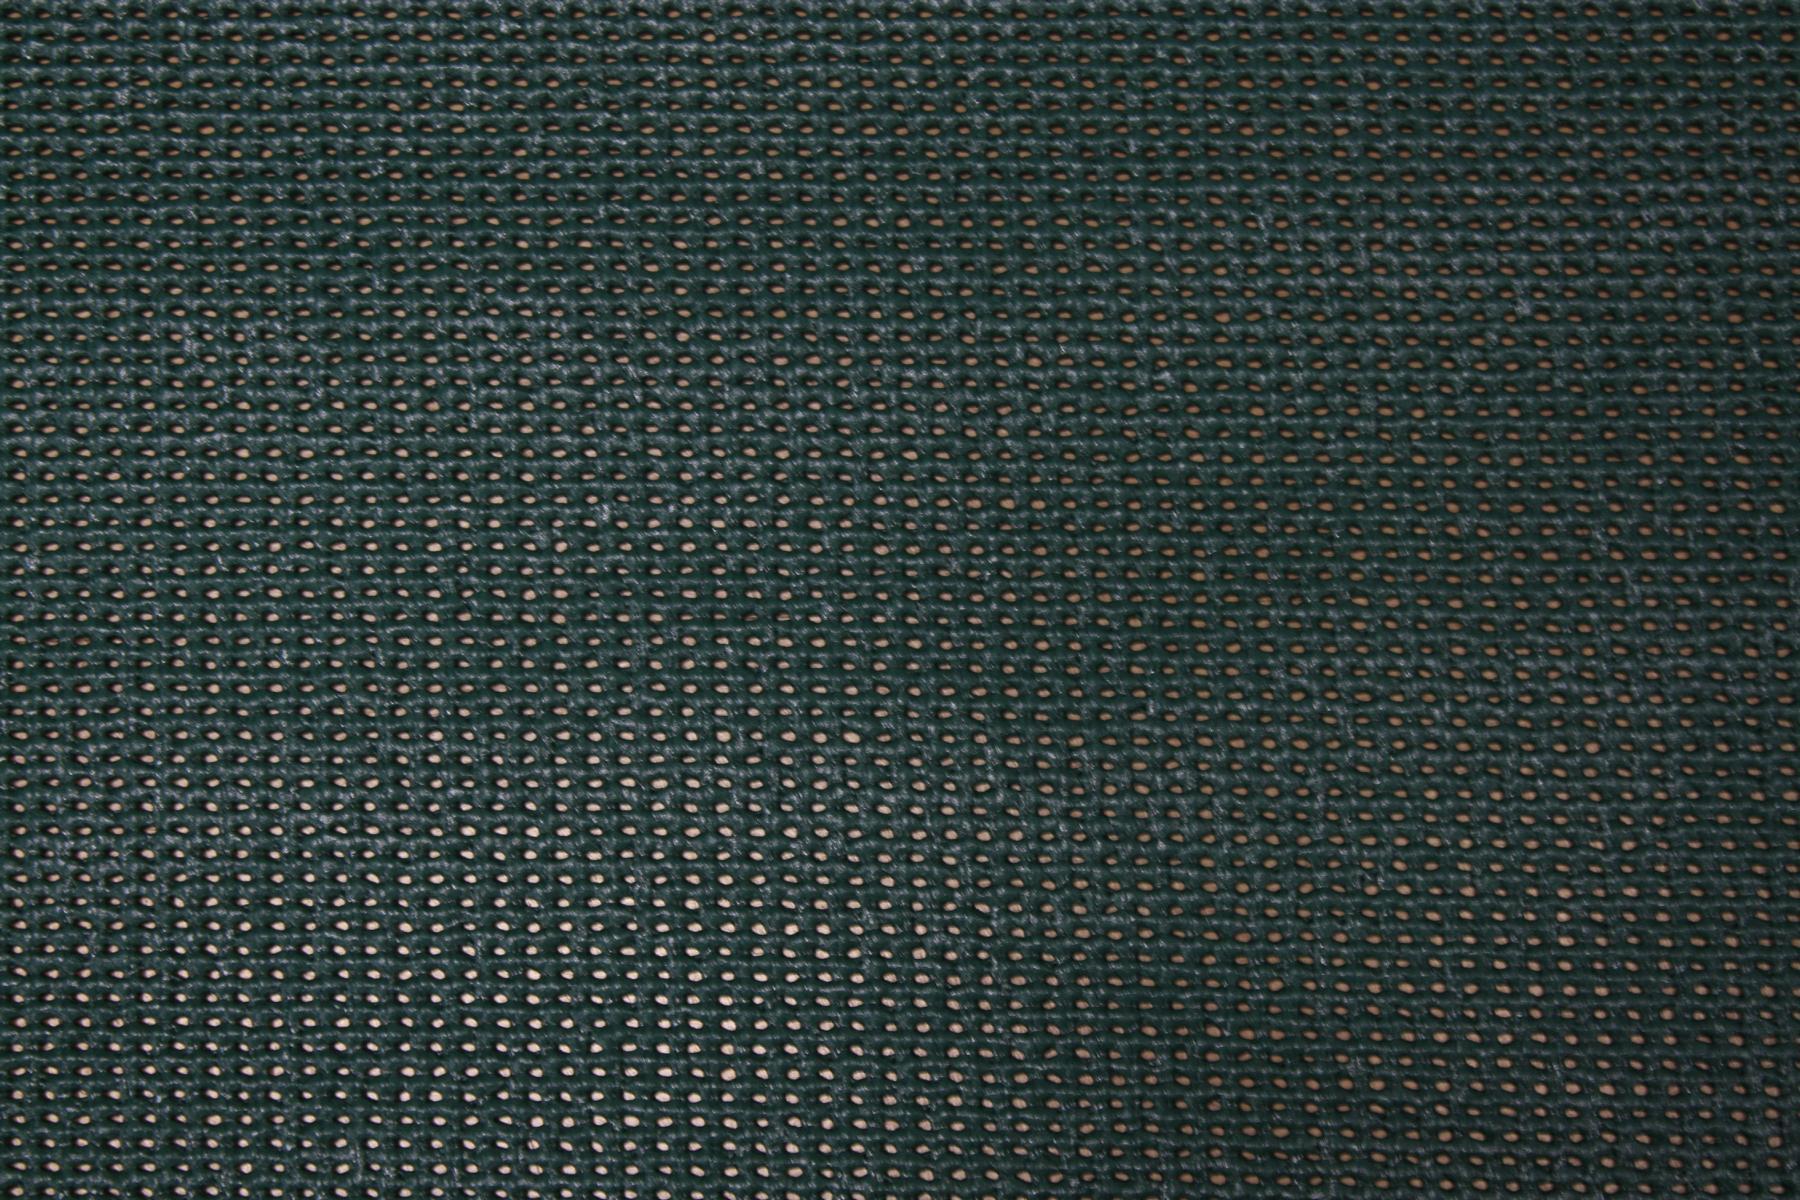 zeltteppich campingteppich vorzeltteppich gr n 250 x 300. Black Bedroom Furniture Sets. Home Design Ideas